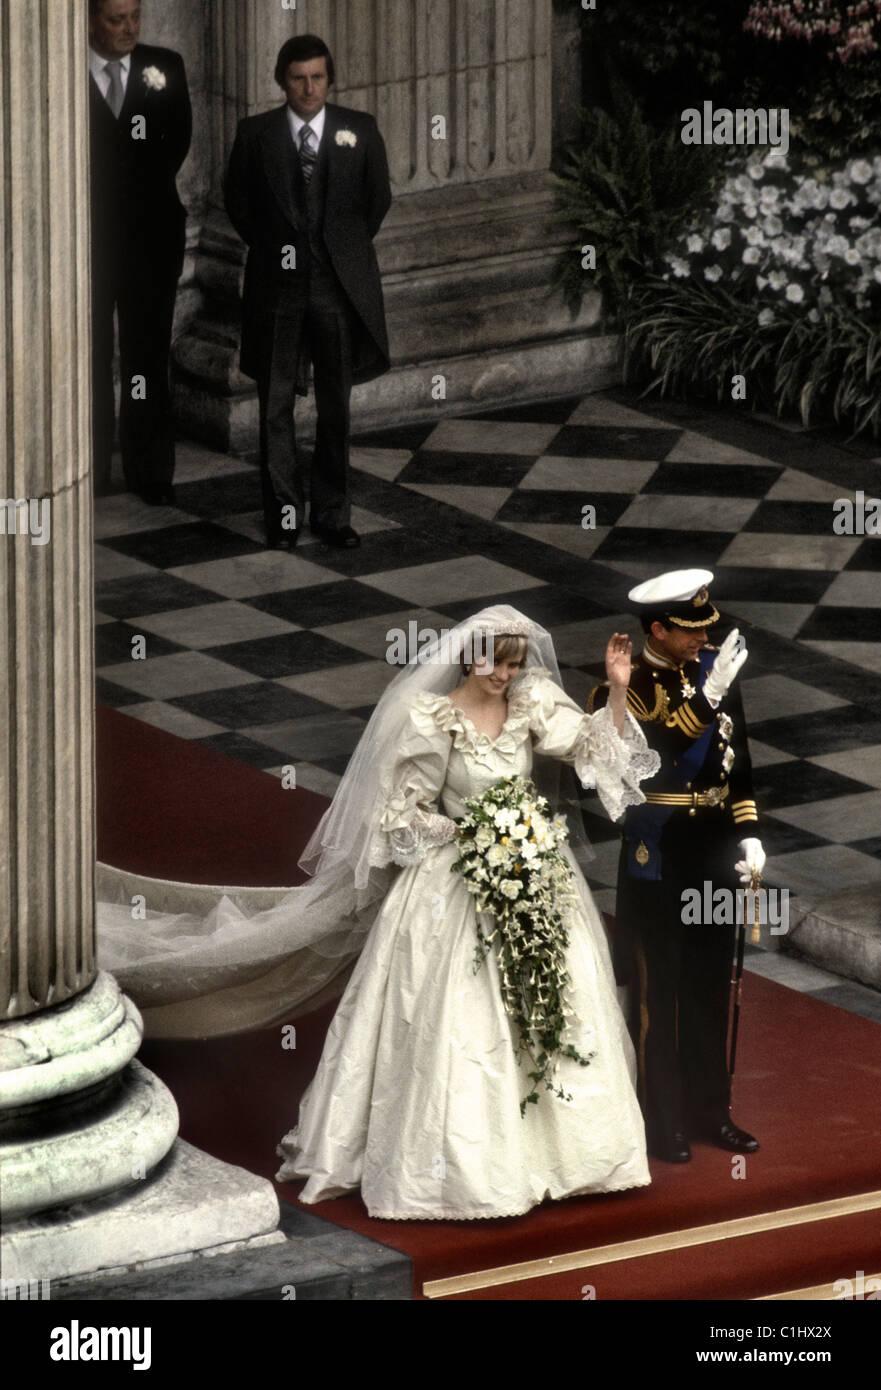 Royal Wedding del principe Charles e Lady Diana Spencer Foto Stock